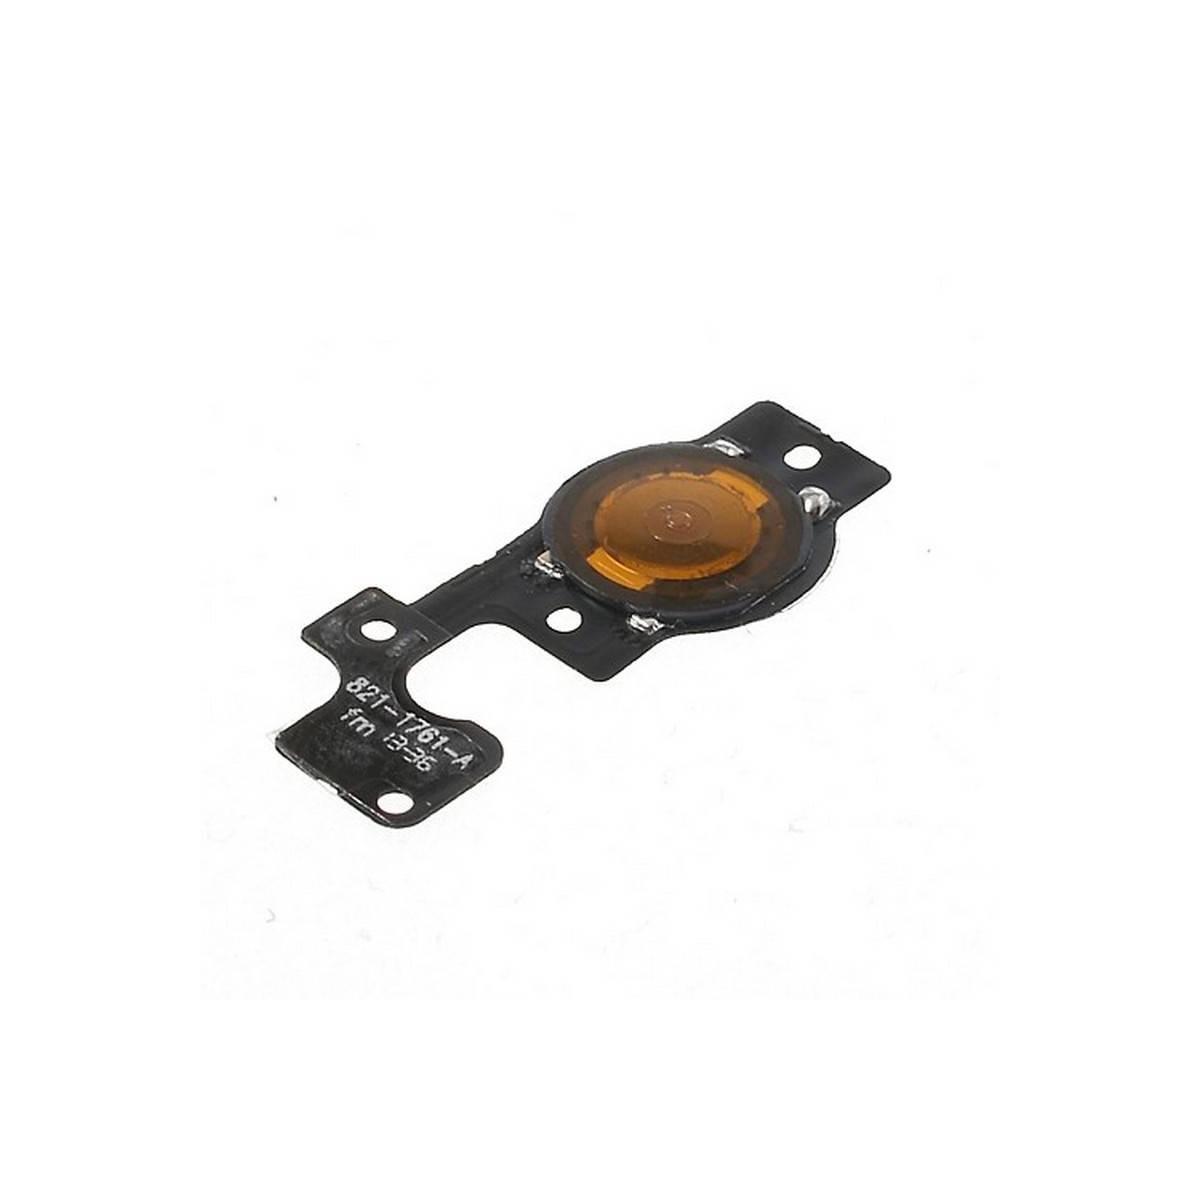 flex del boton home iphone 5c